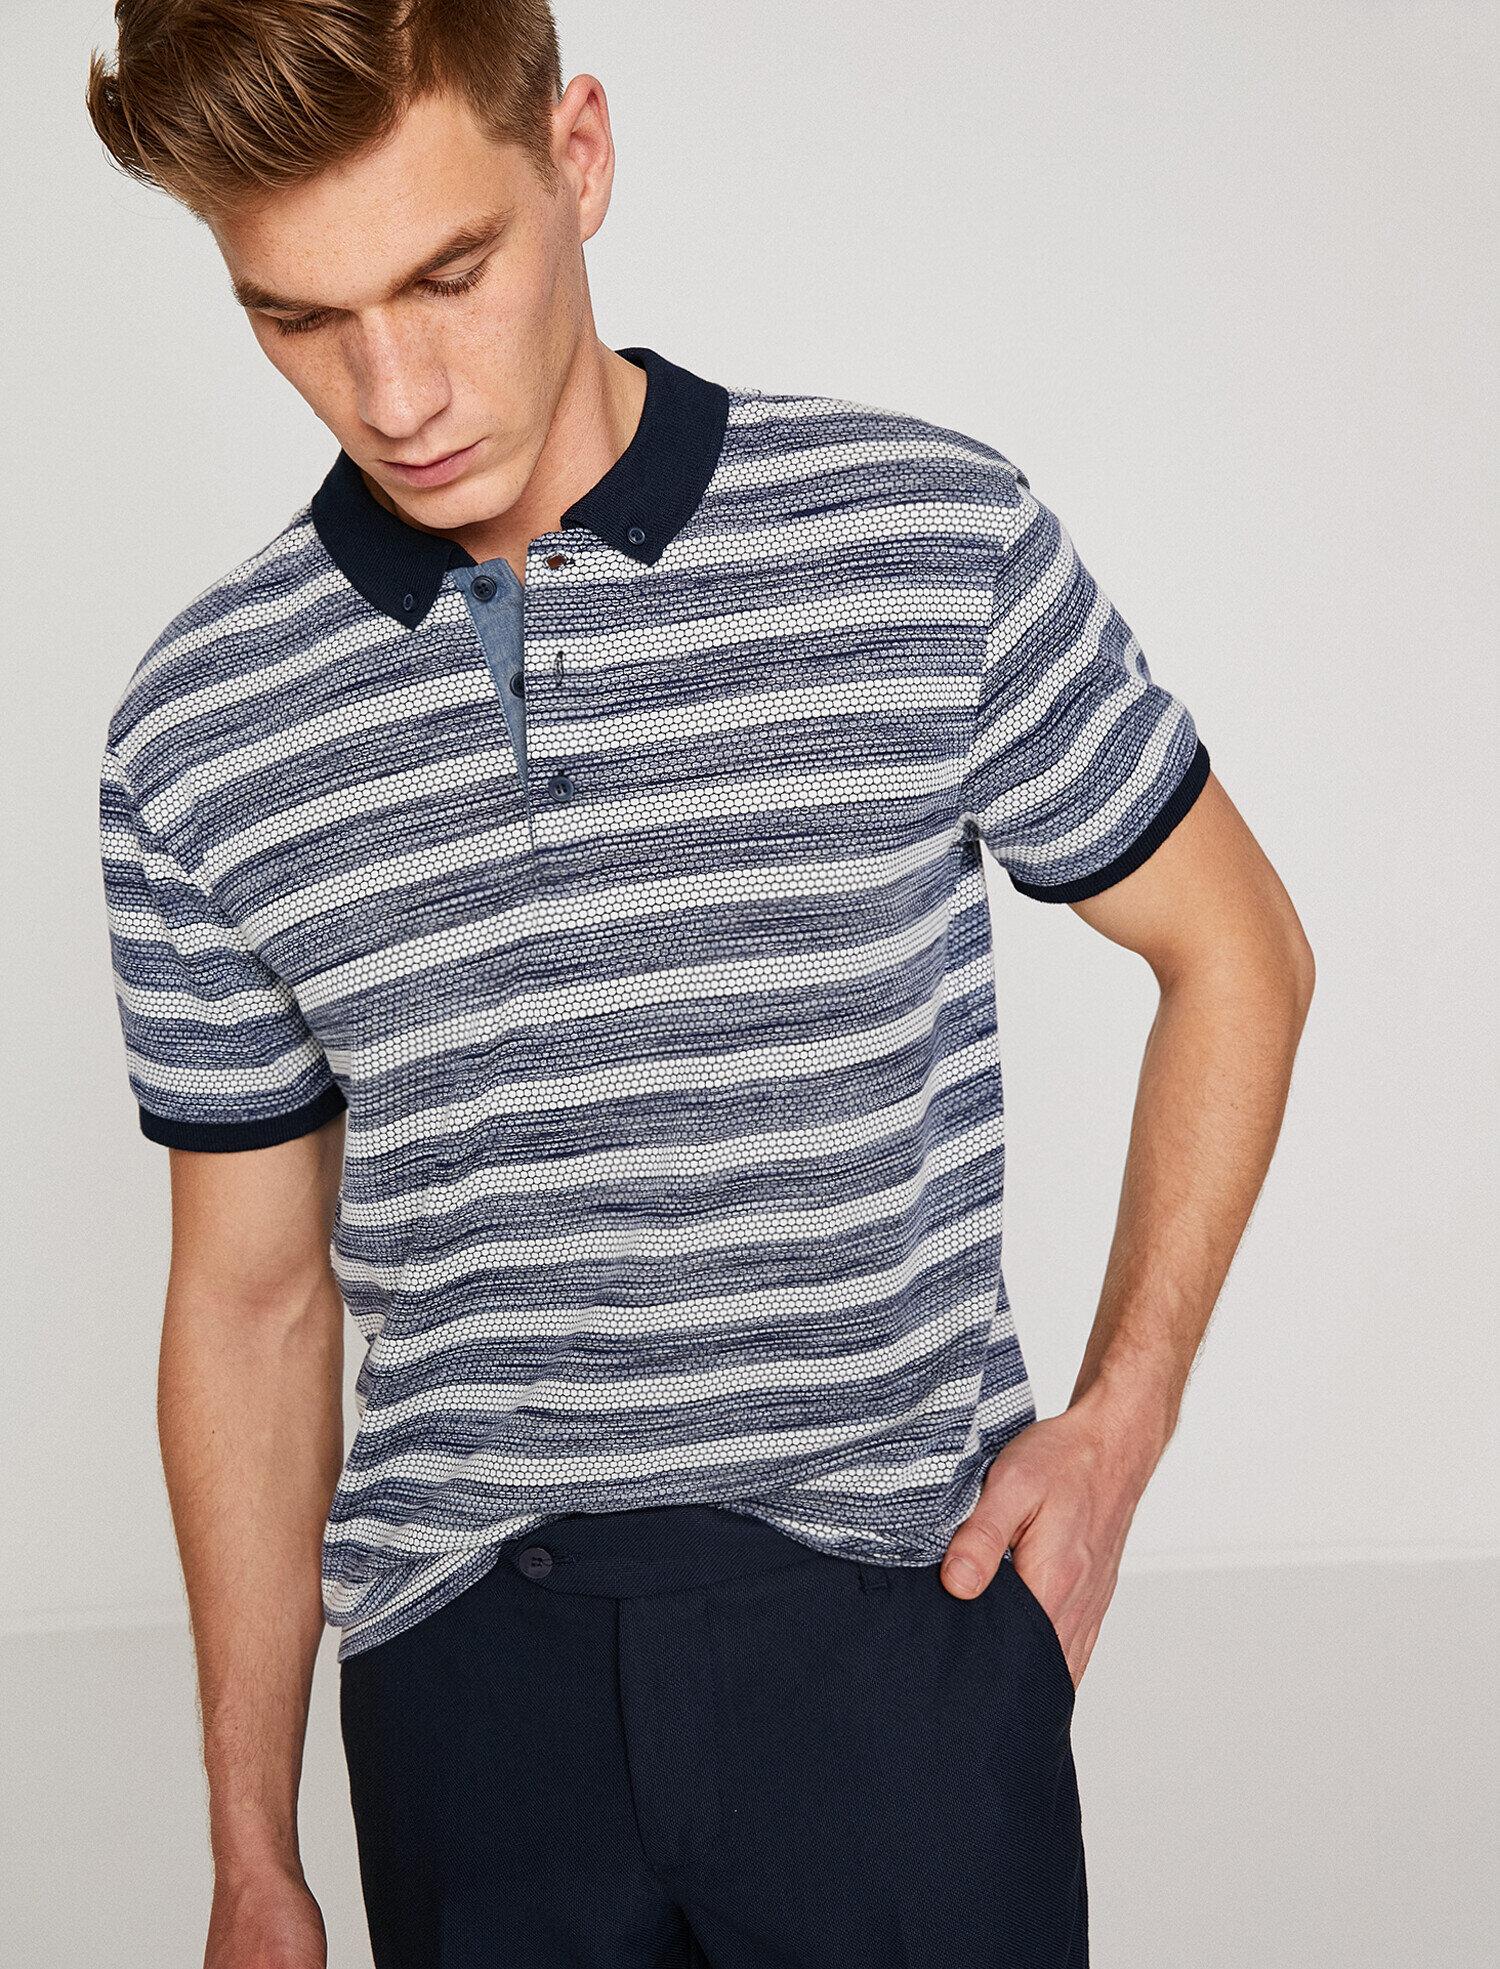 24e8b1b1311a Navy Striped Men Polo Neck T-Shirt 8YAM11548LK01M